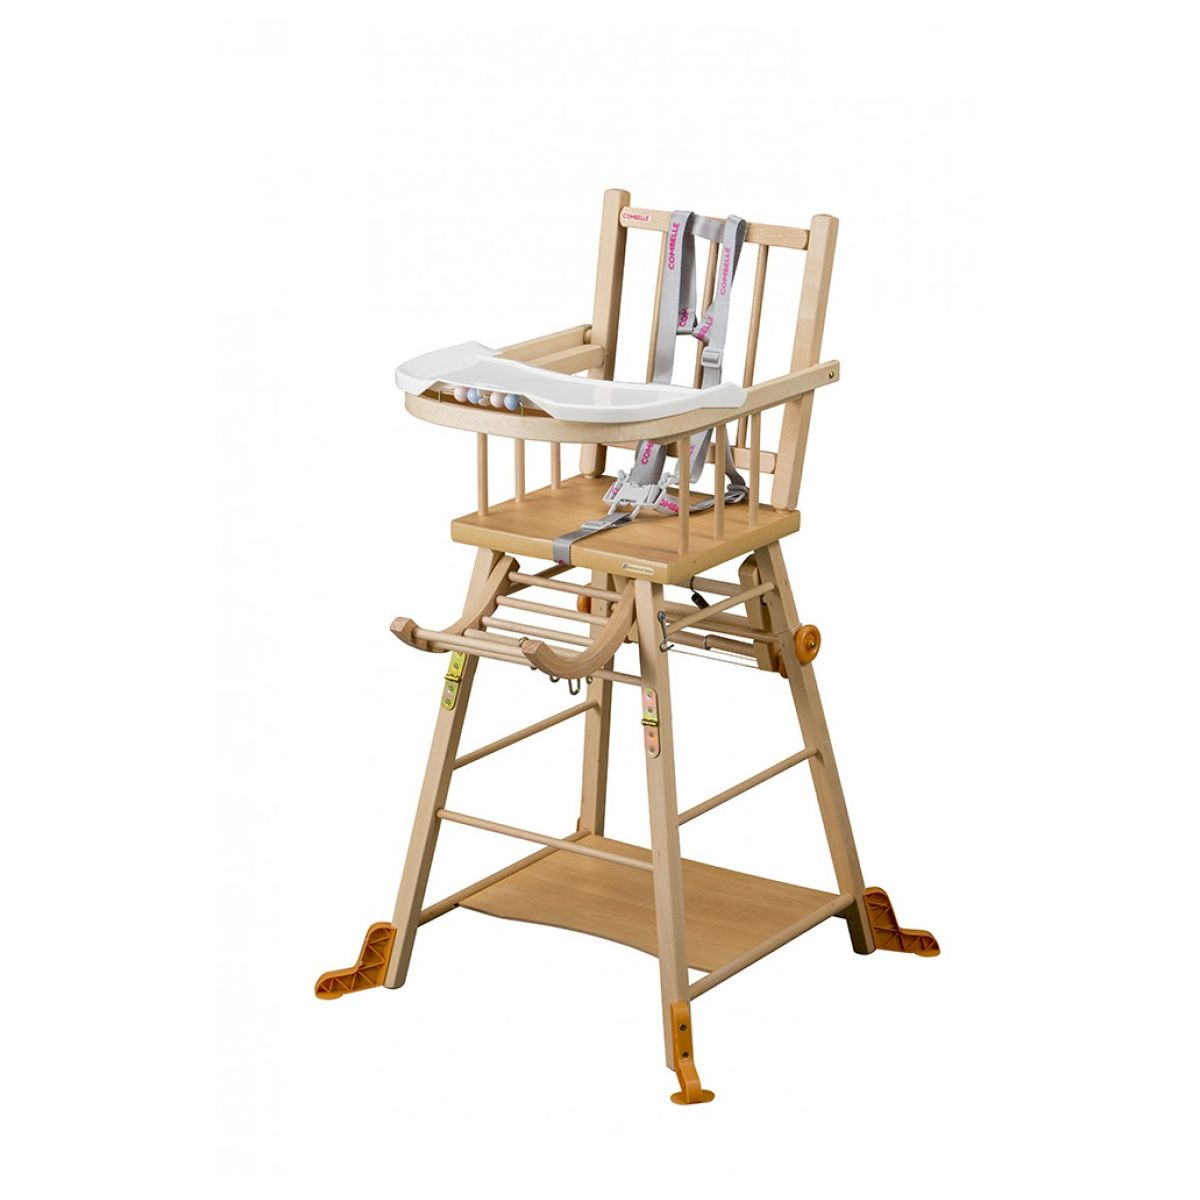 Chaise Transformable Haute Naturel Marcel Vernis thdQrs